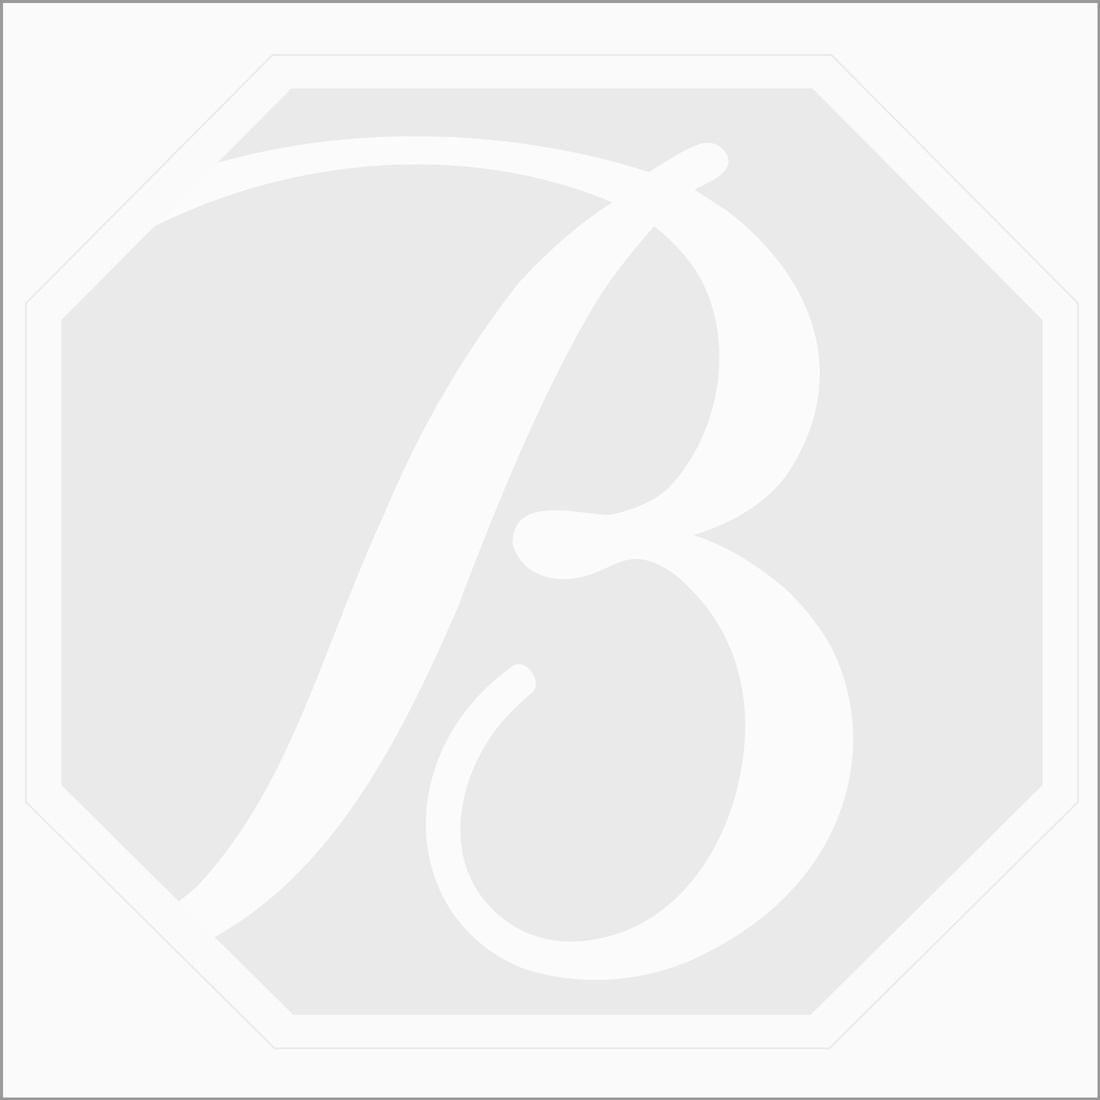 8 x 6 mm - Dark Brown Rose Cut Diamond Pear Shape - 3.53 carats (FncyDiaRC1060)